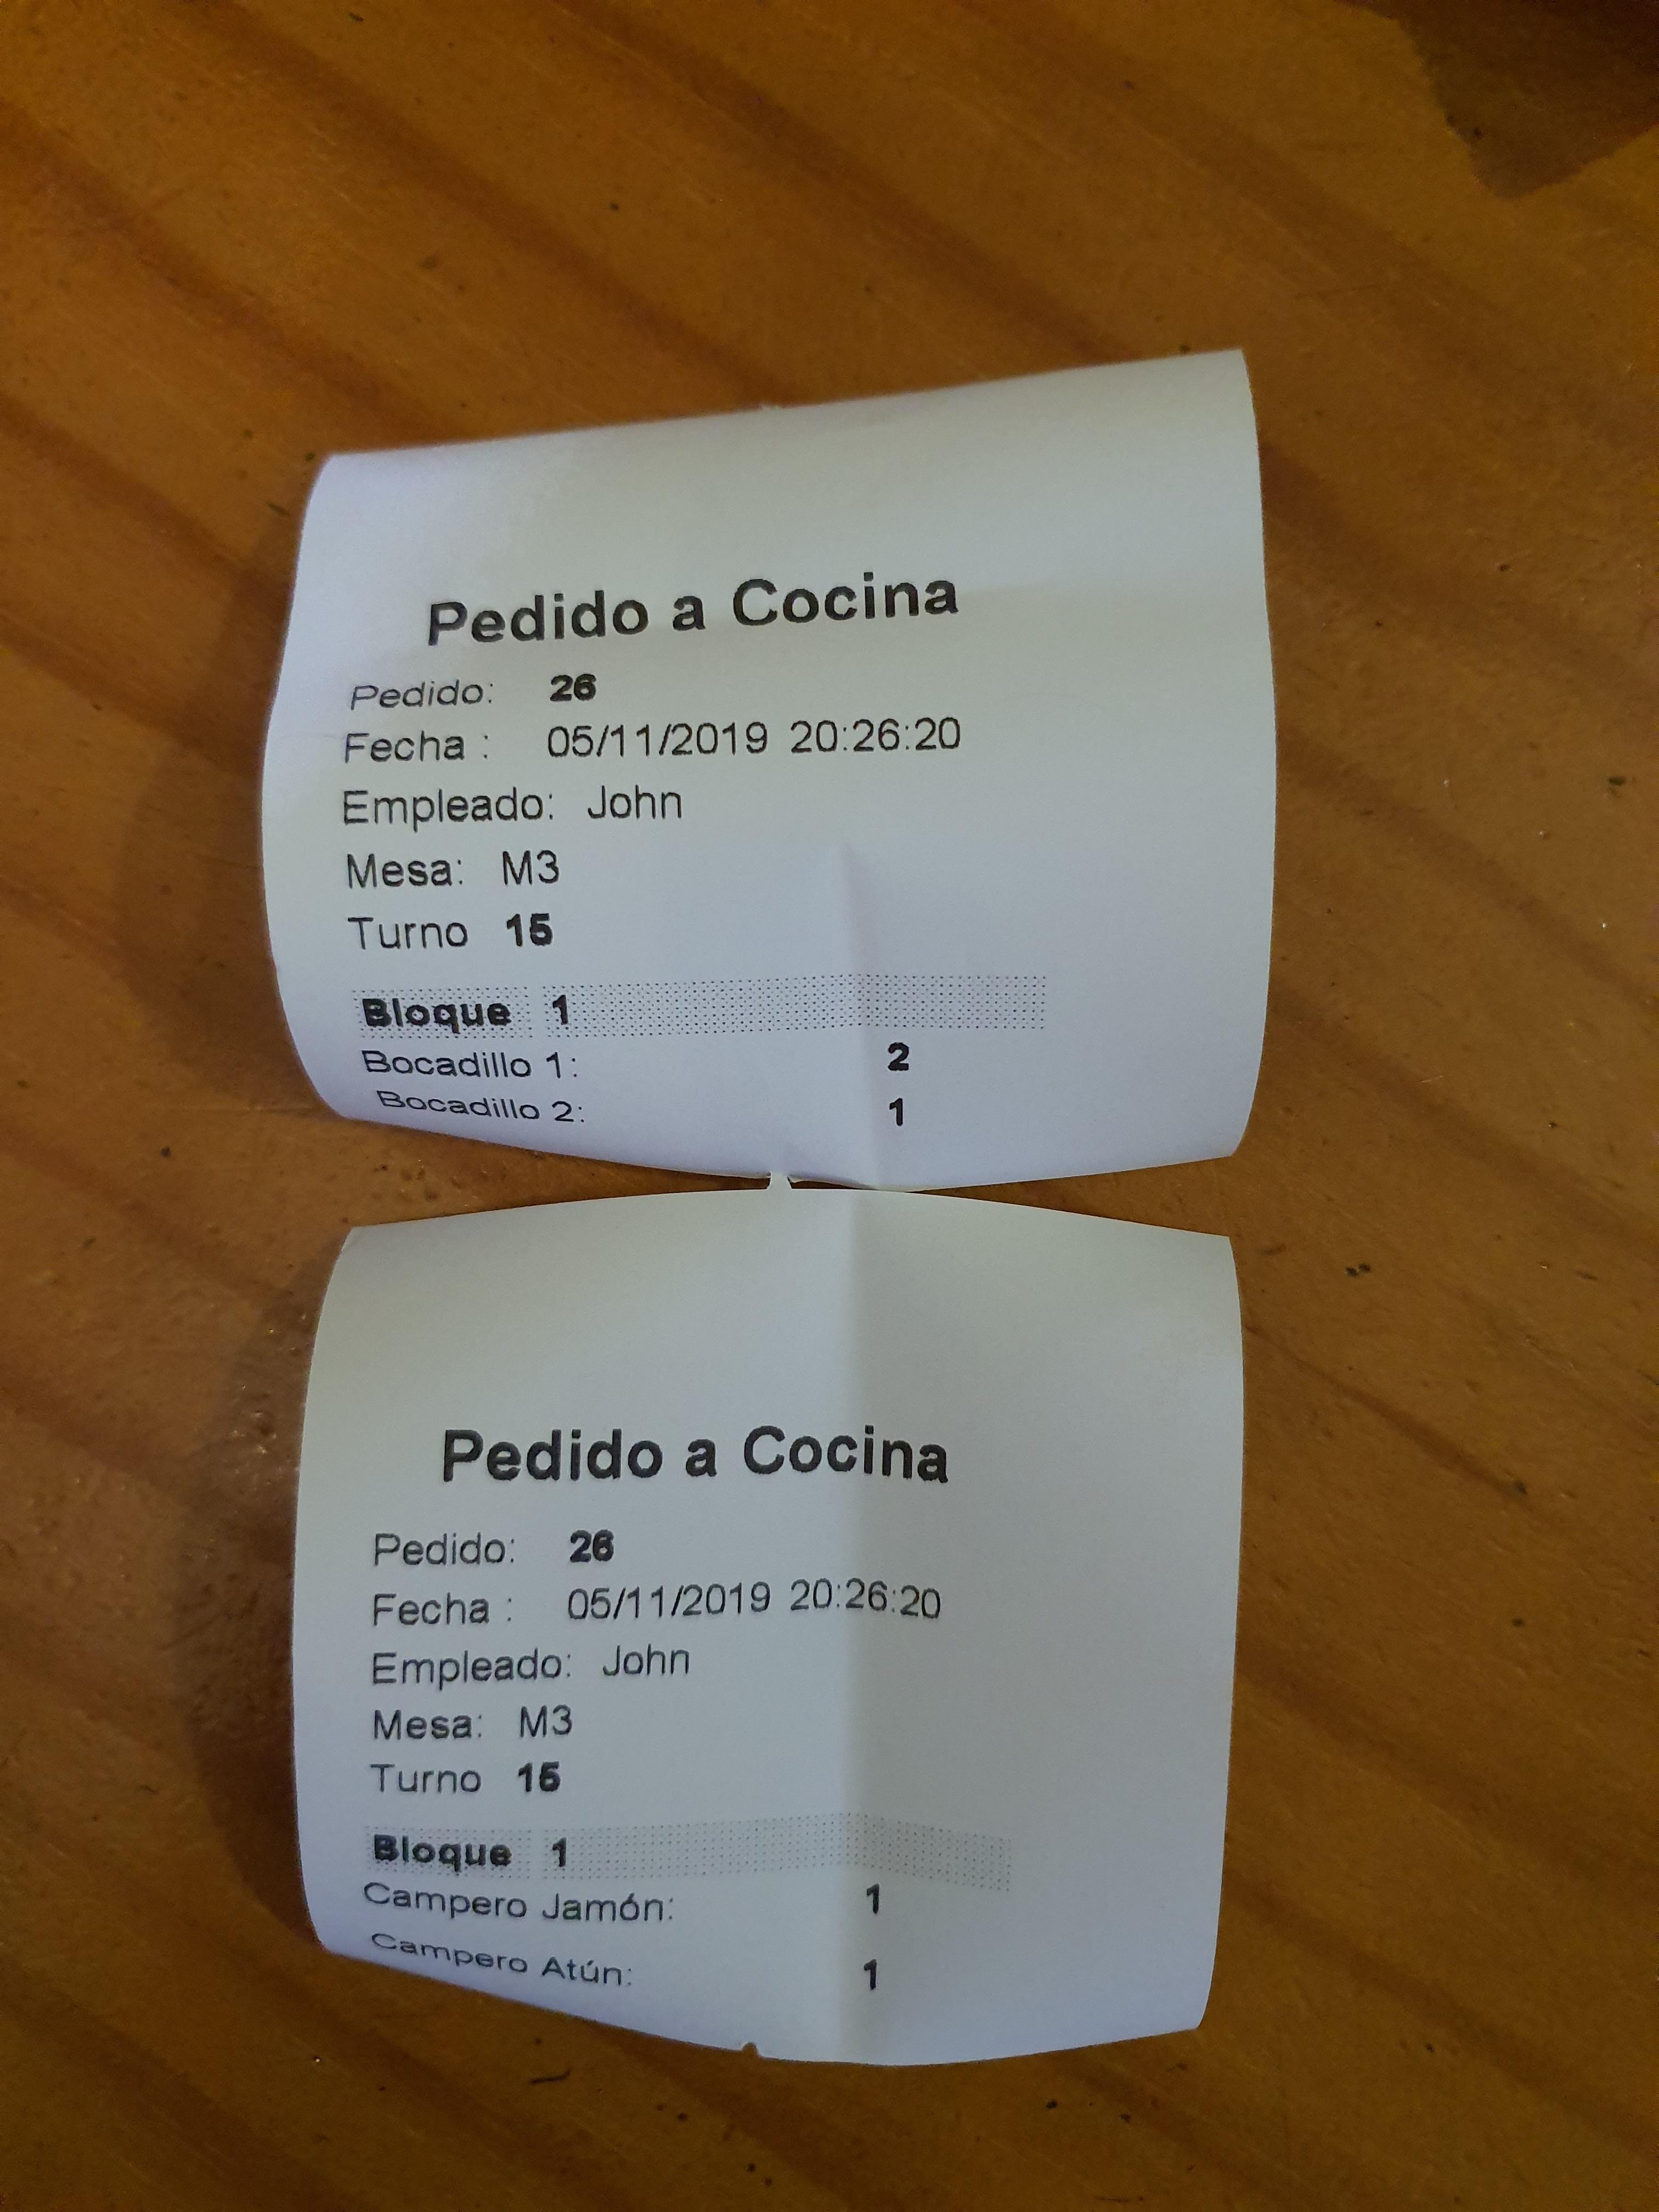 [Imagen: ticket.jpg]